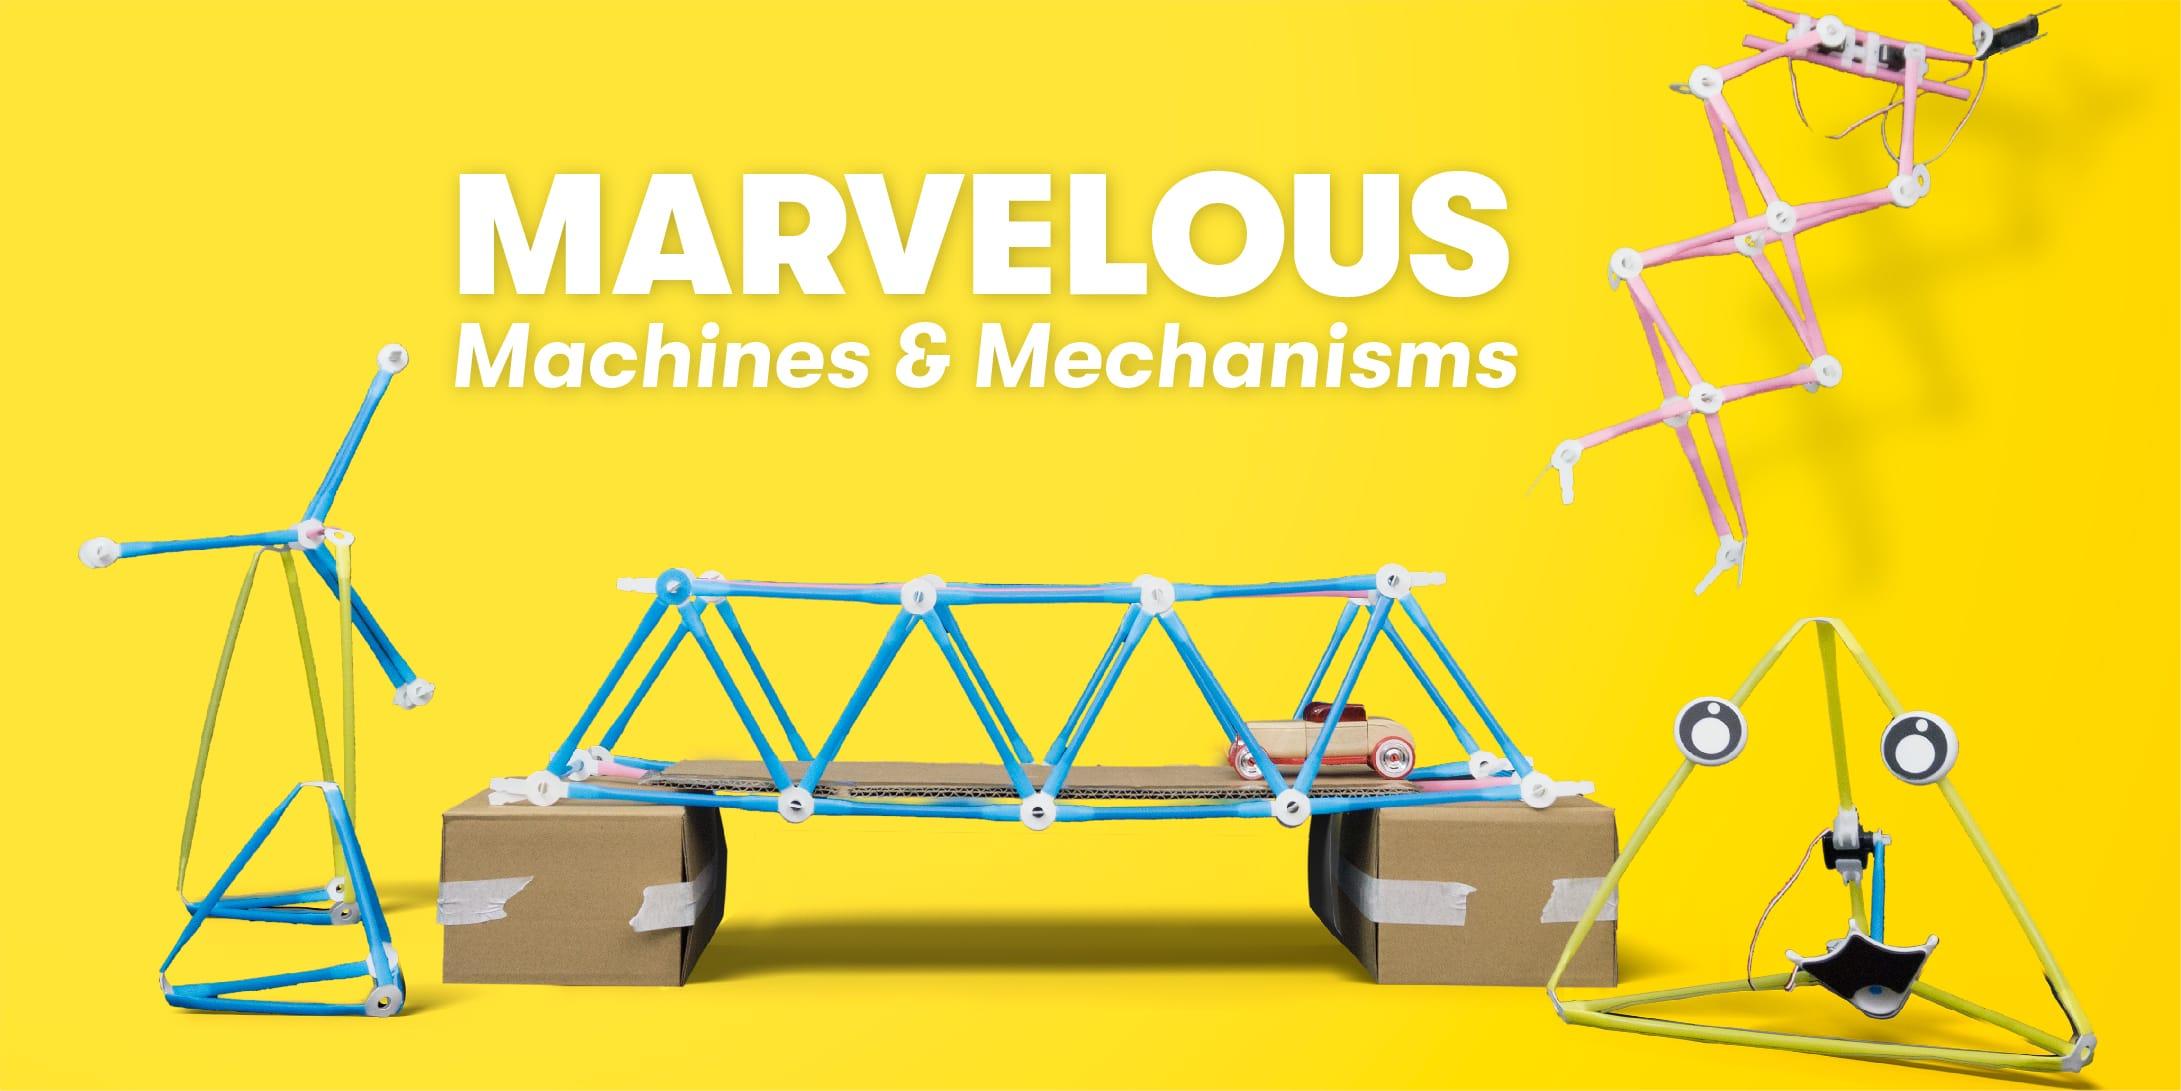 marvelous-machines-mechanisms2:1 Ages 7-13no-logo